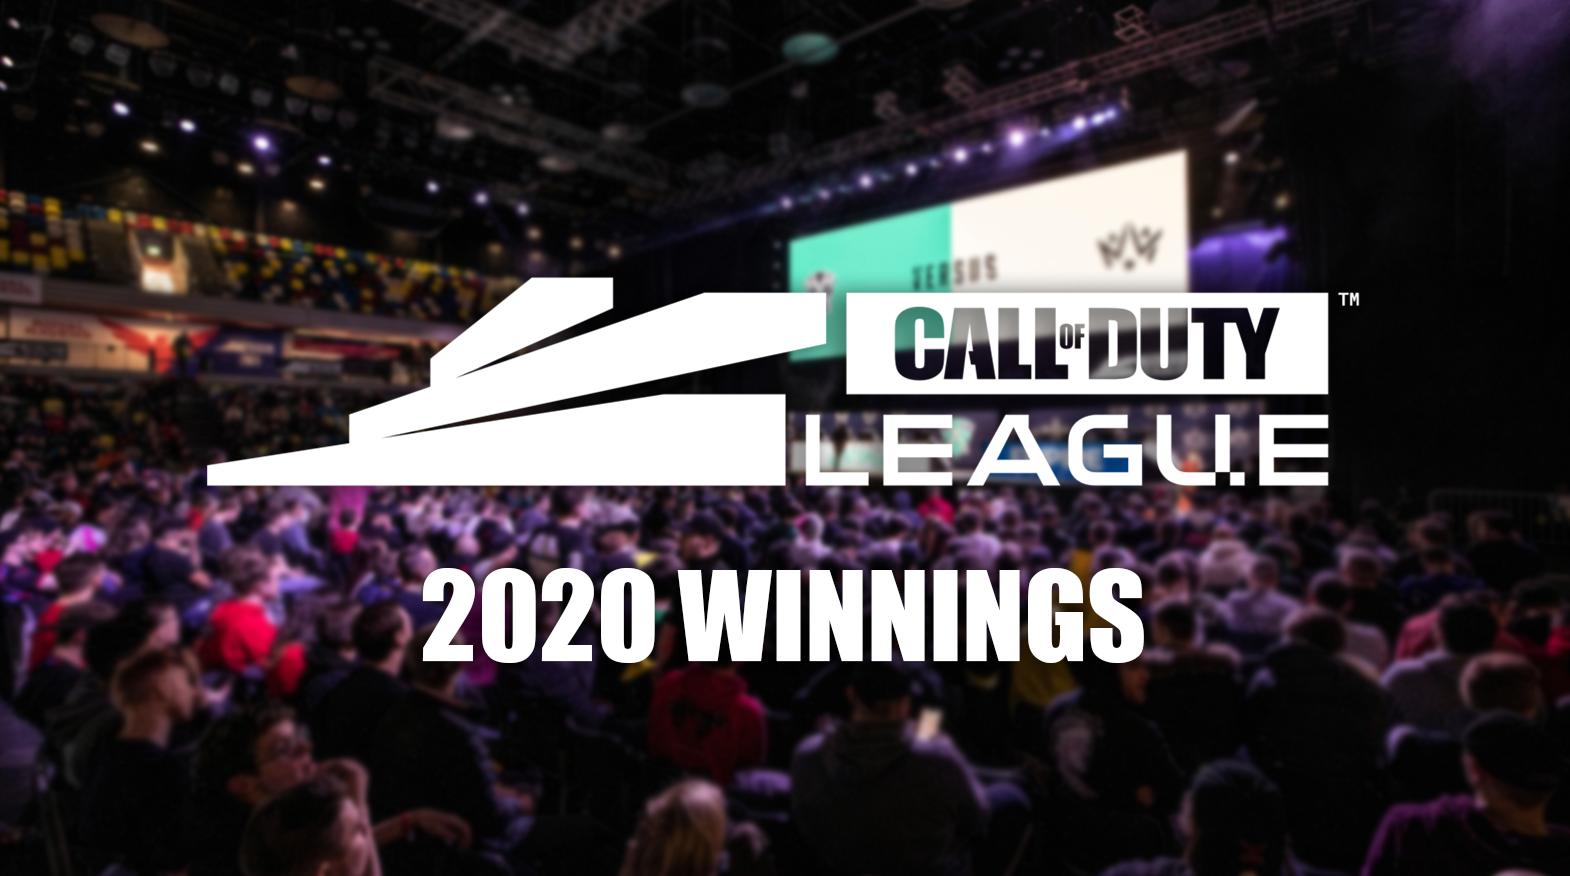 Call of Duty League London Open crowd